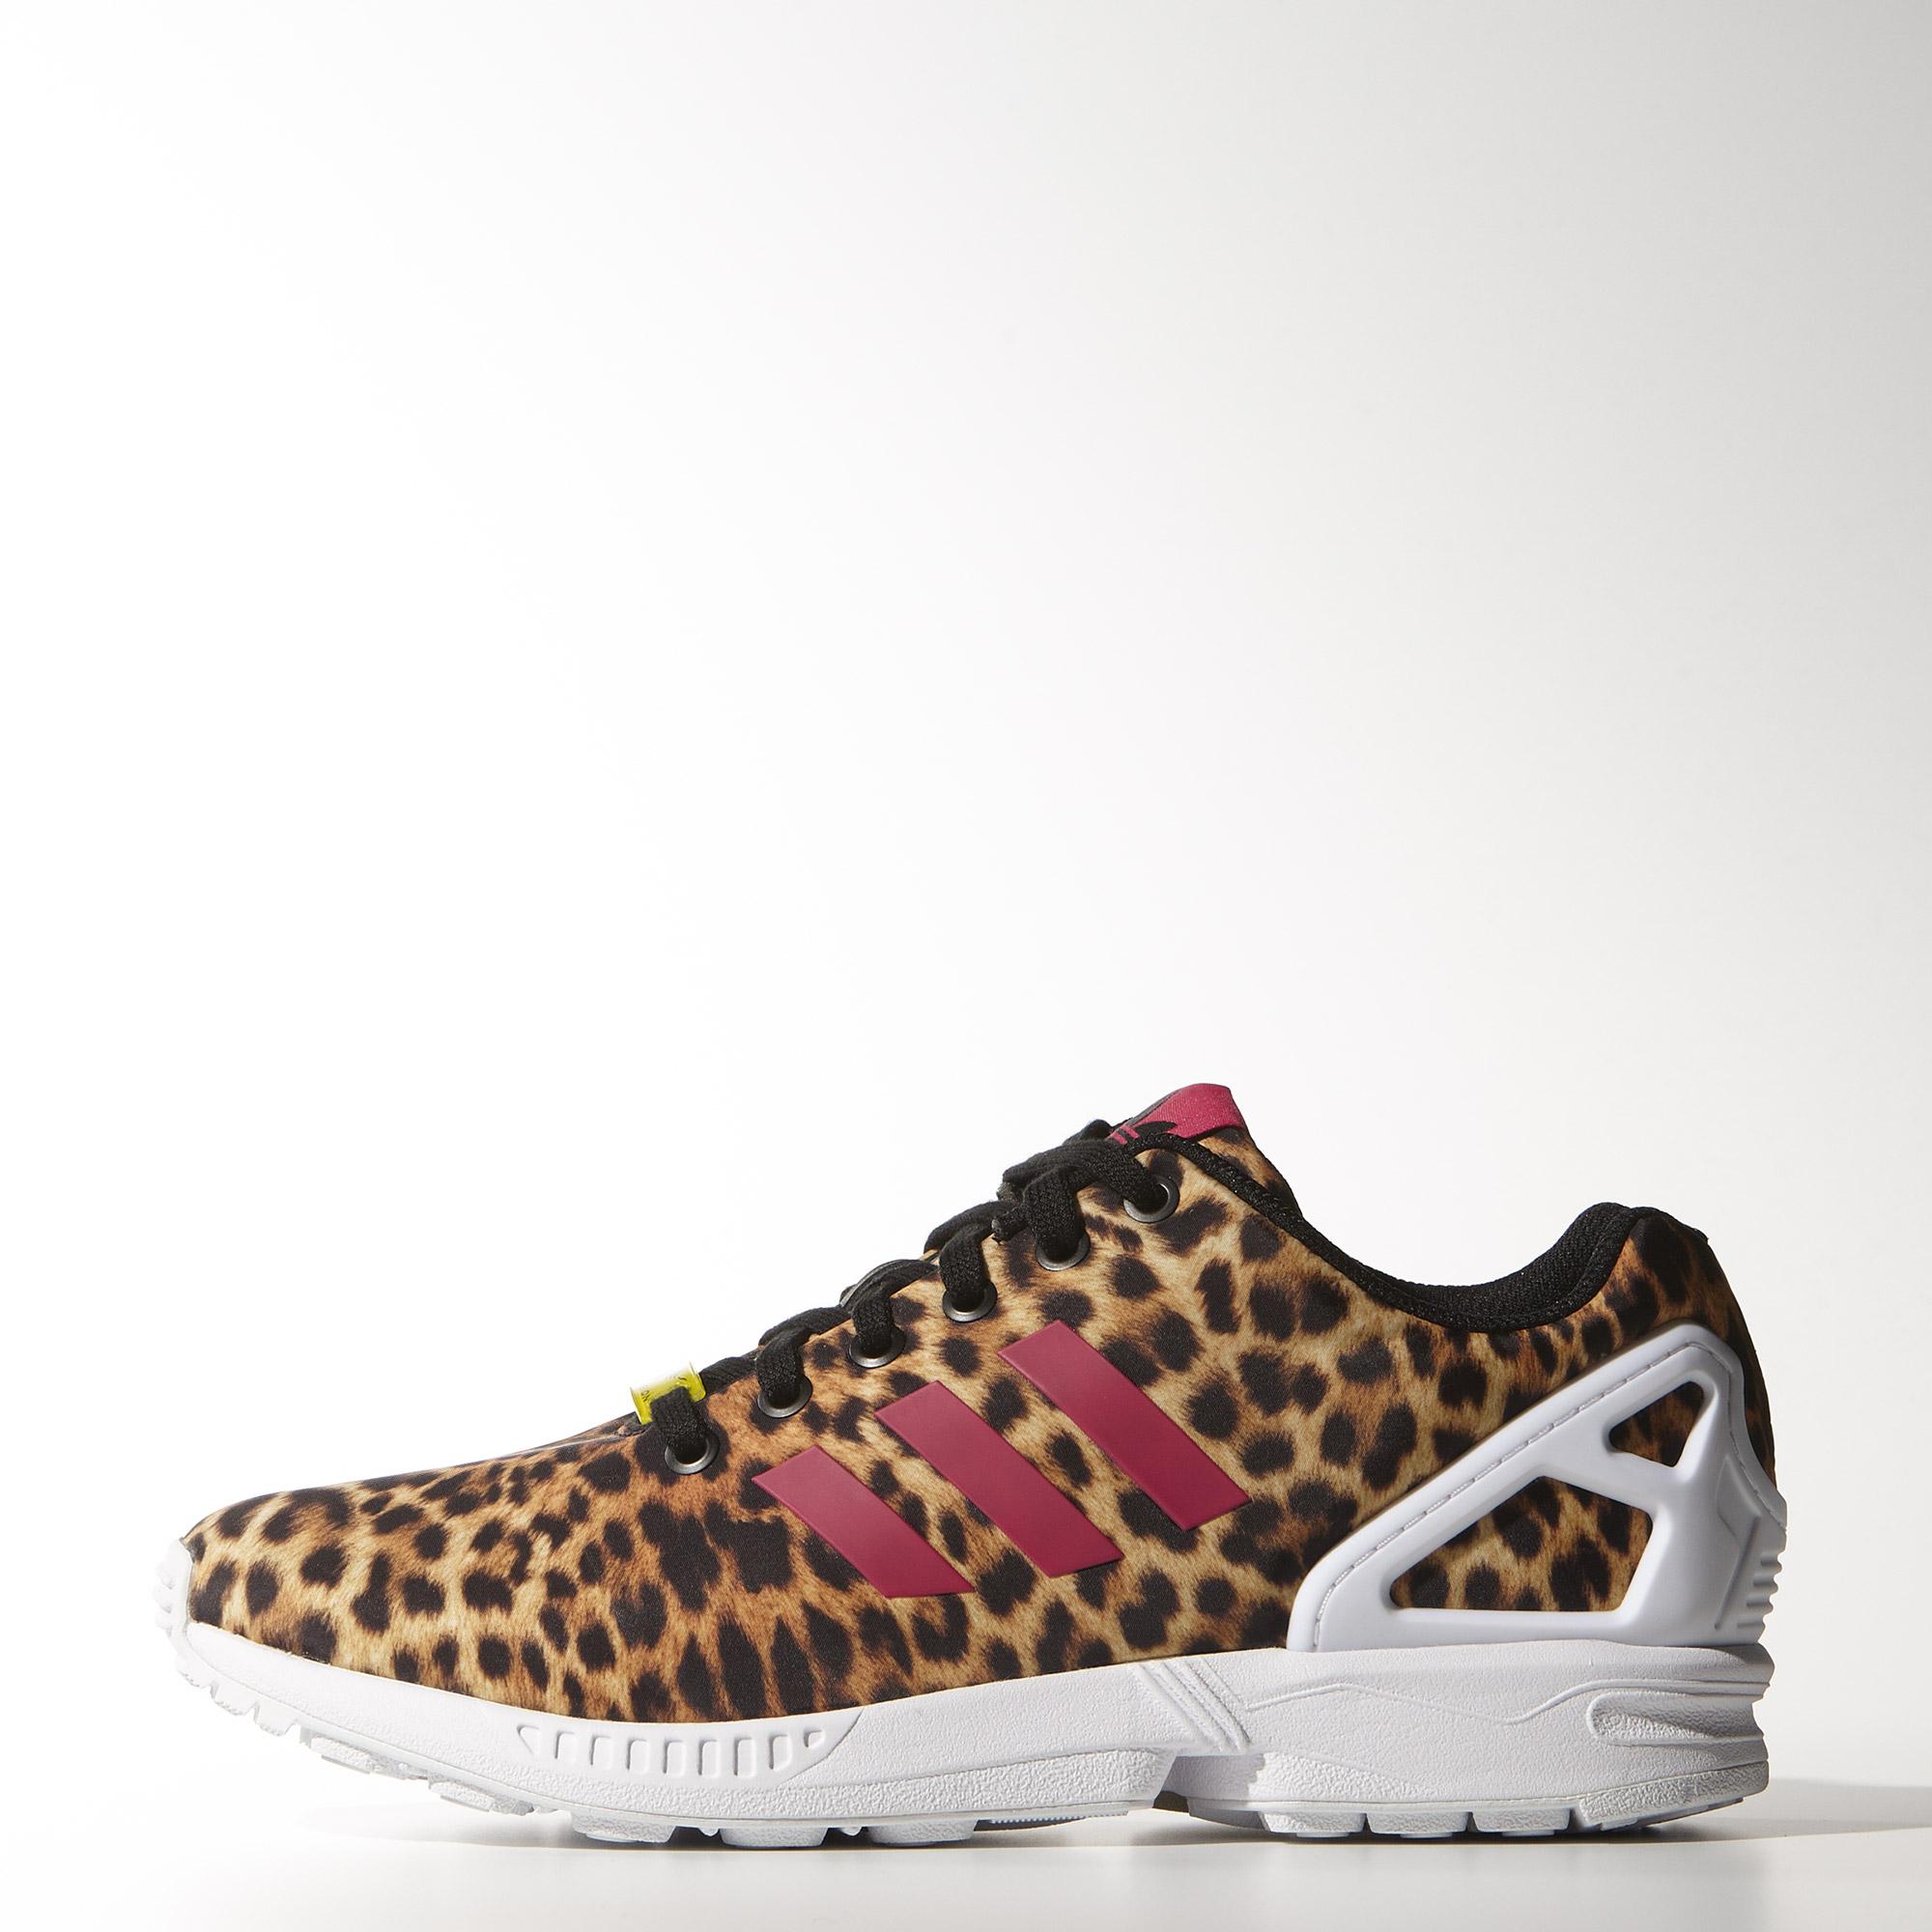 zx flux adidas leopardate